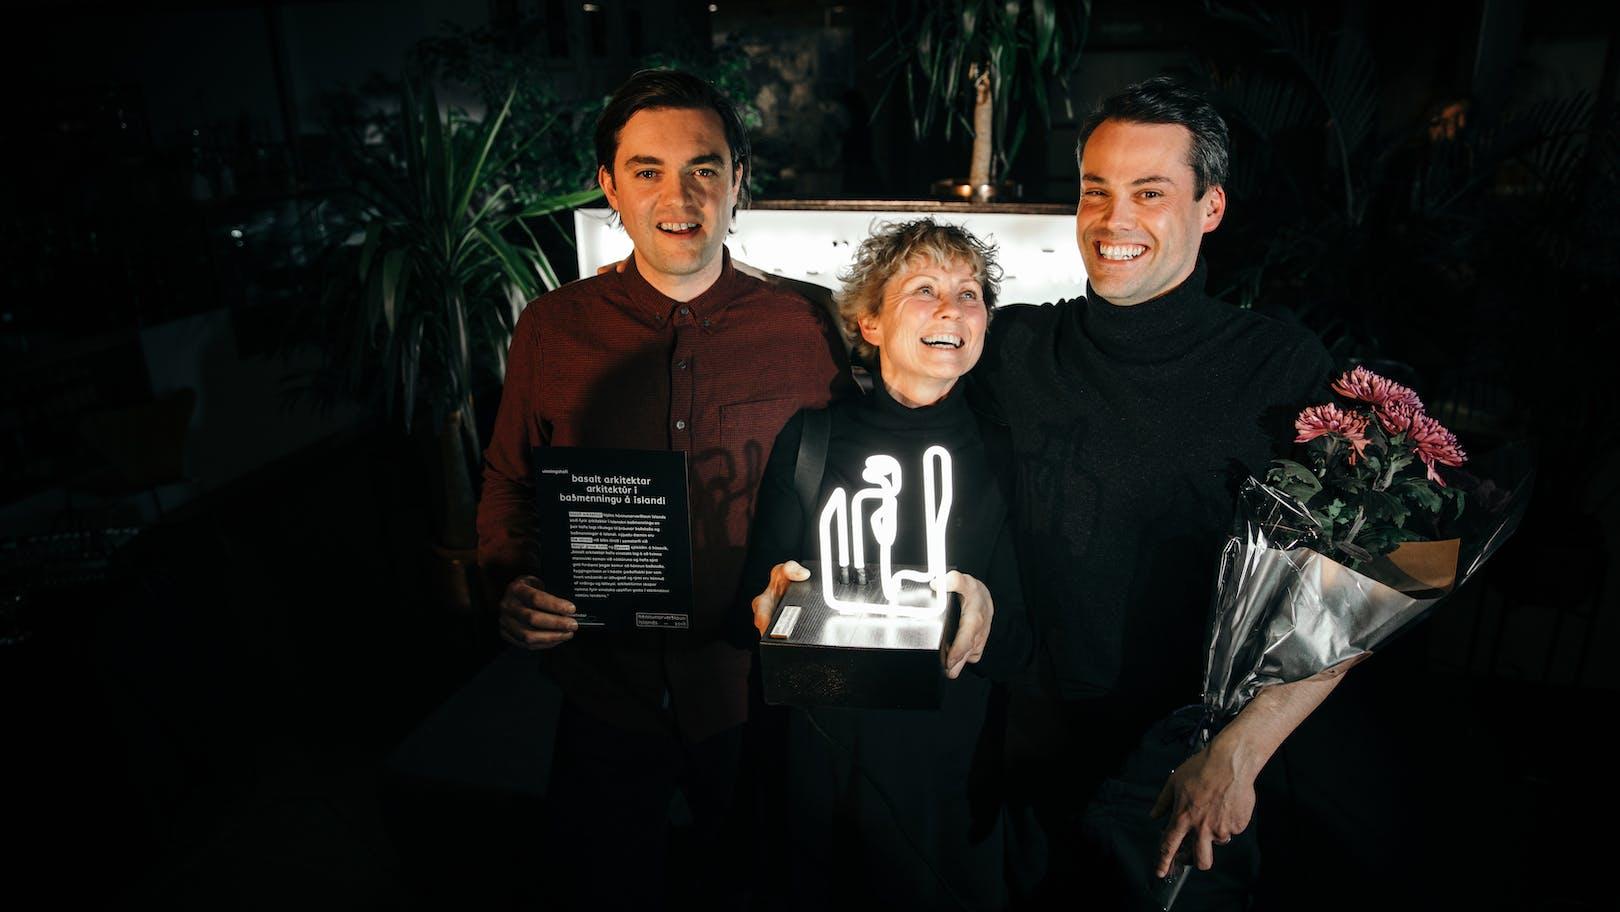 Marcos Zotes, Sigríður Sigþórsdóttir & Hrólfur Karl Cela, the owners of Basalt Architects and the winners of the Icelandic Design Awards 2018. Photo: Sunday & White Photography